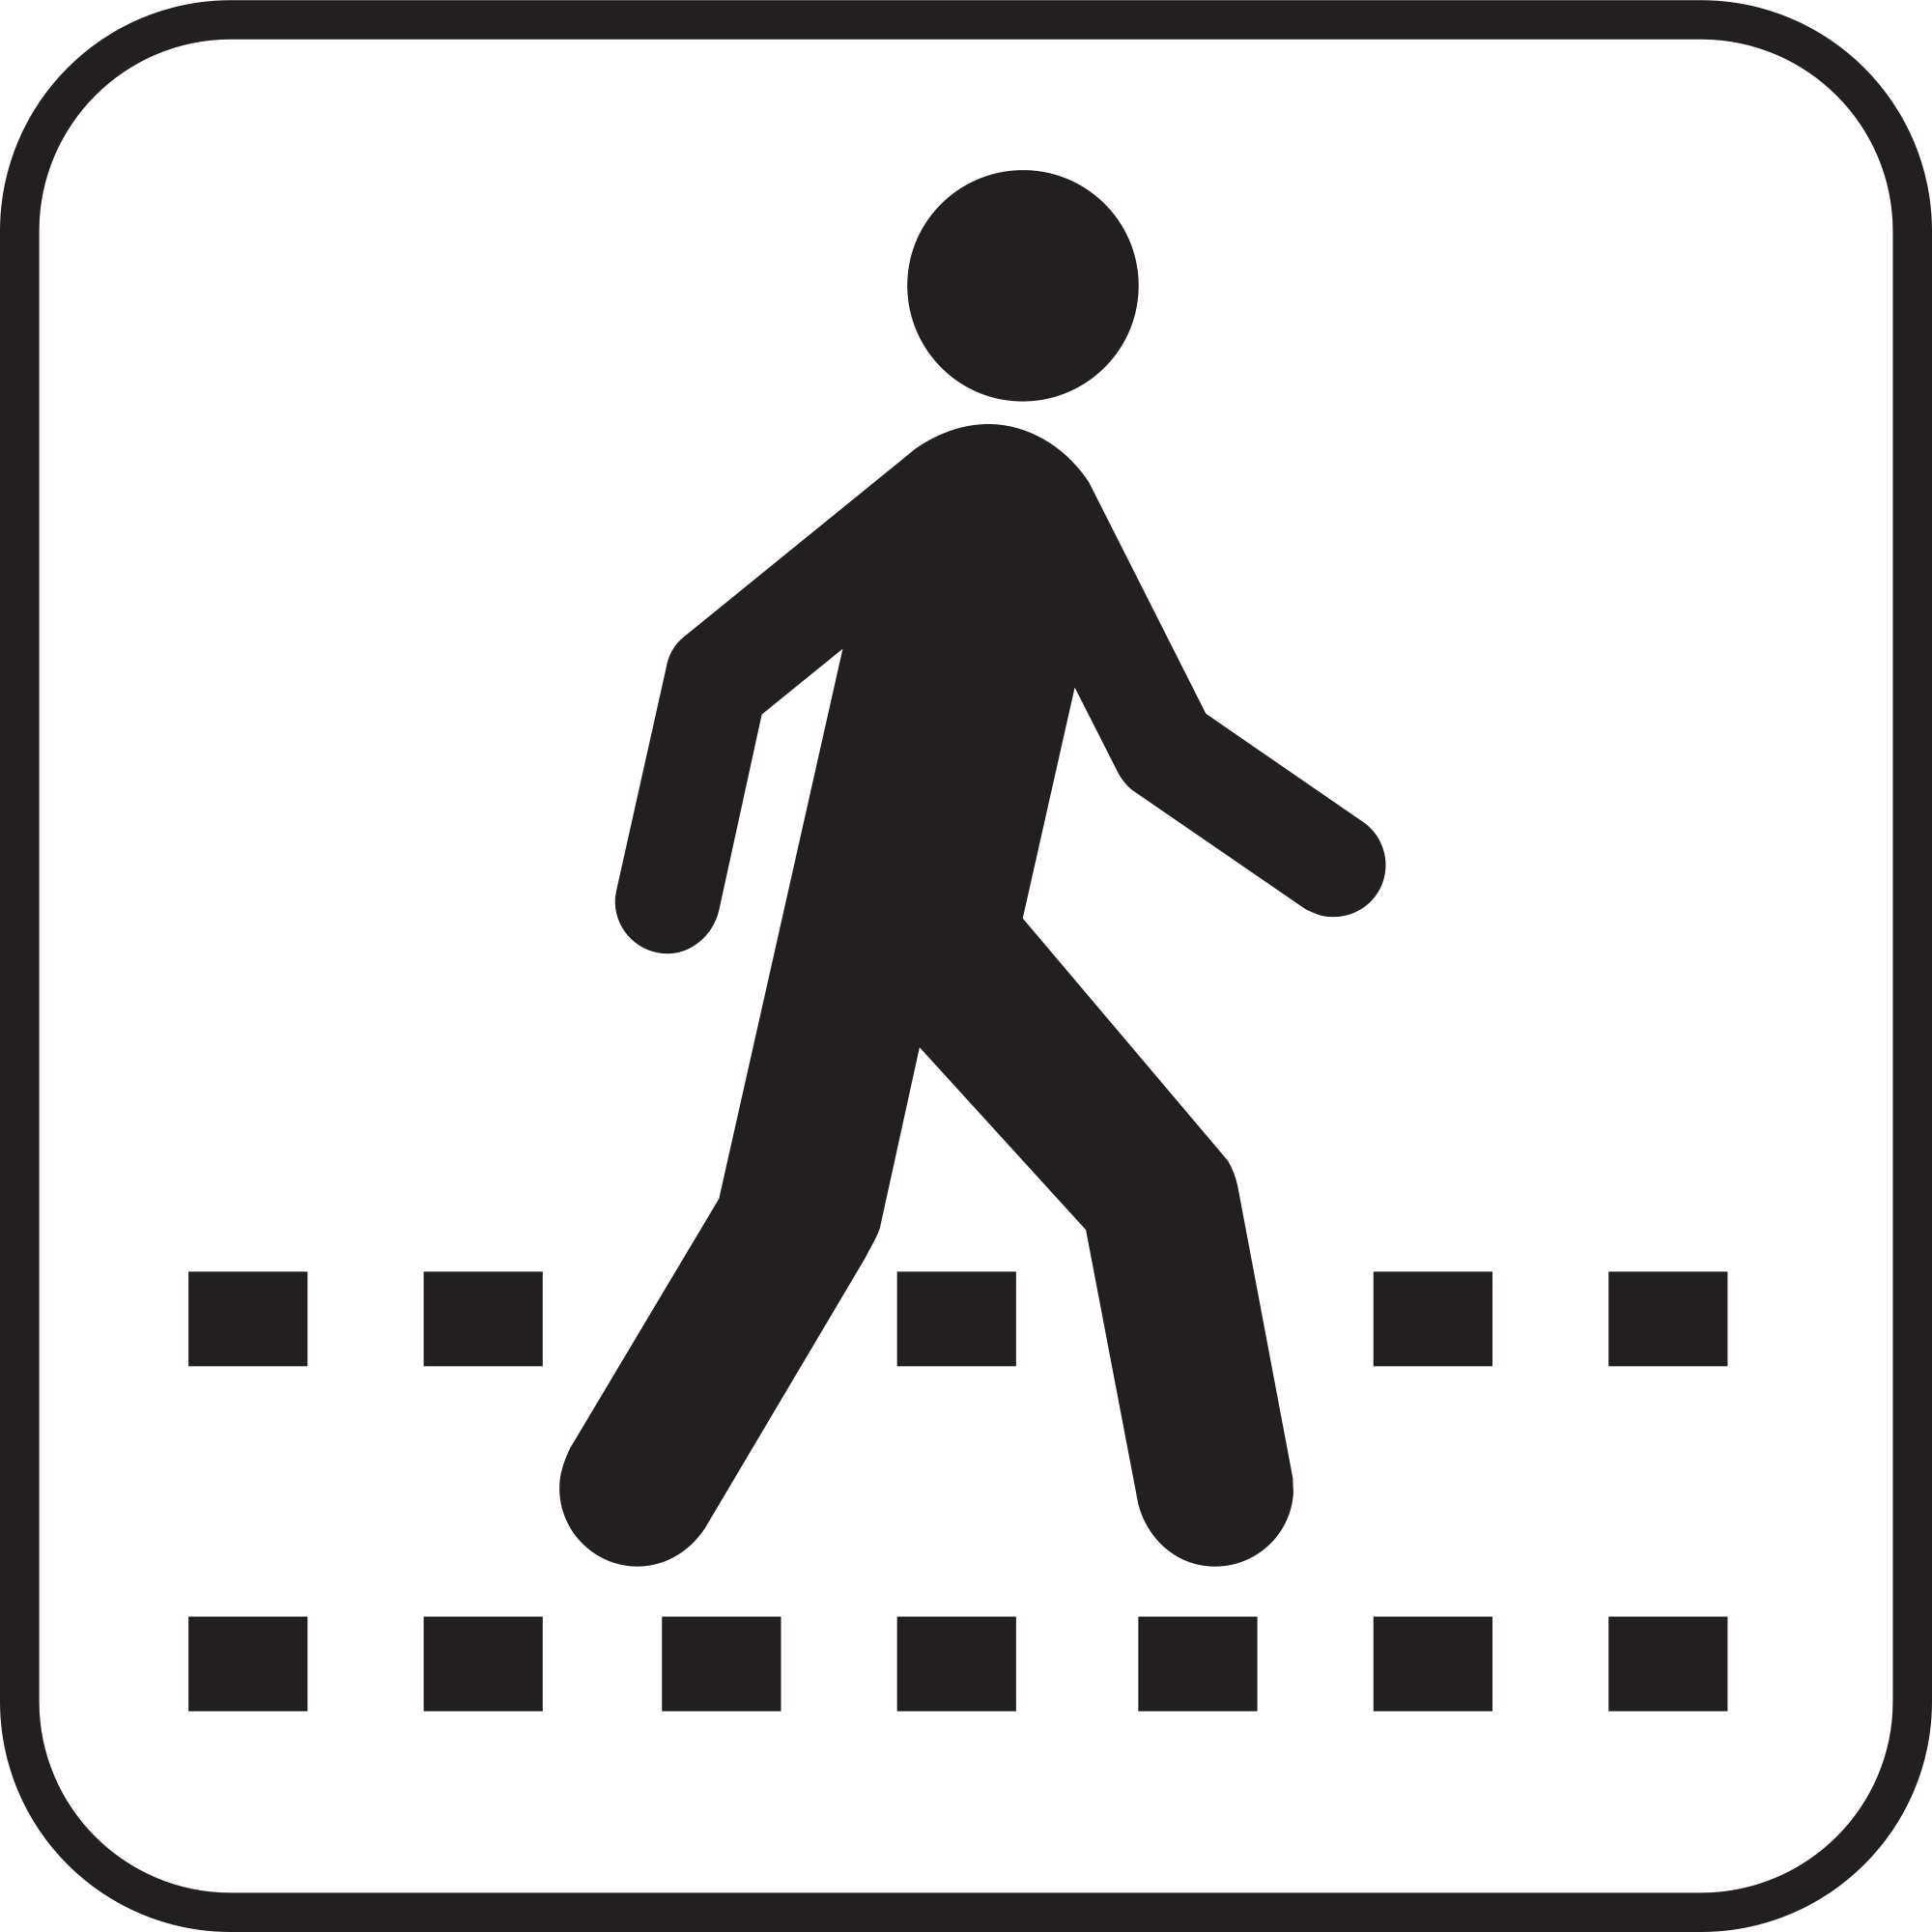 Crossing svg #20, Download drawings